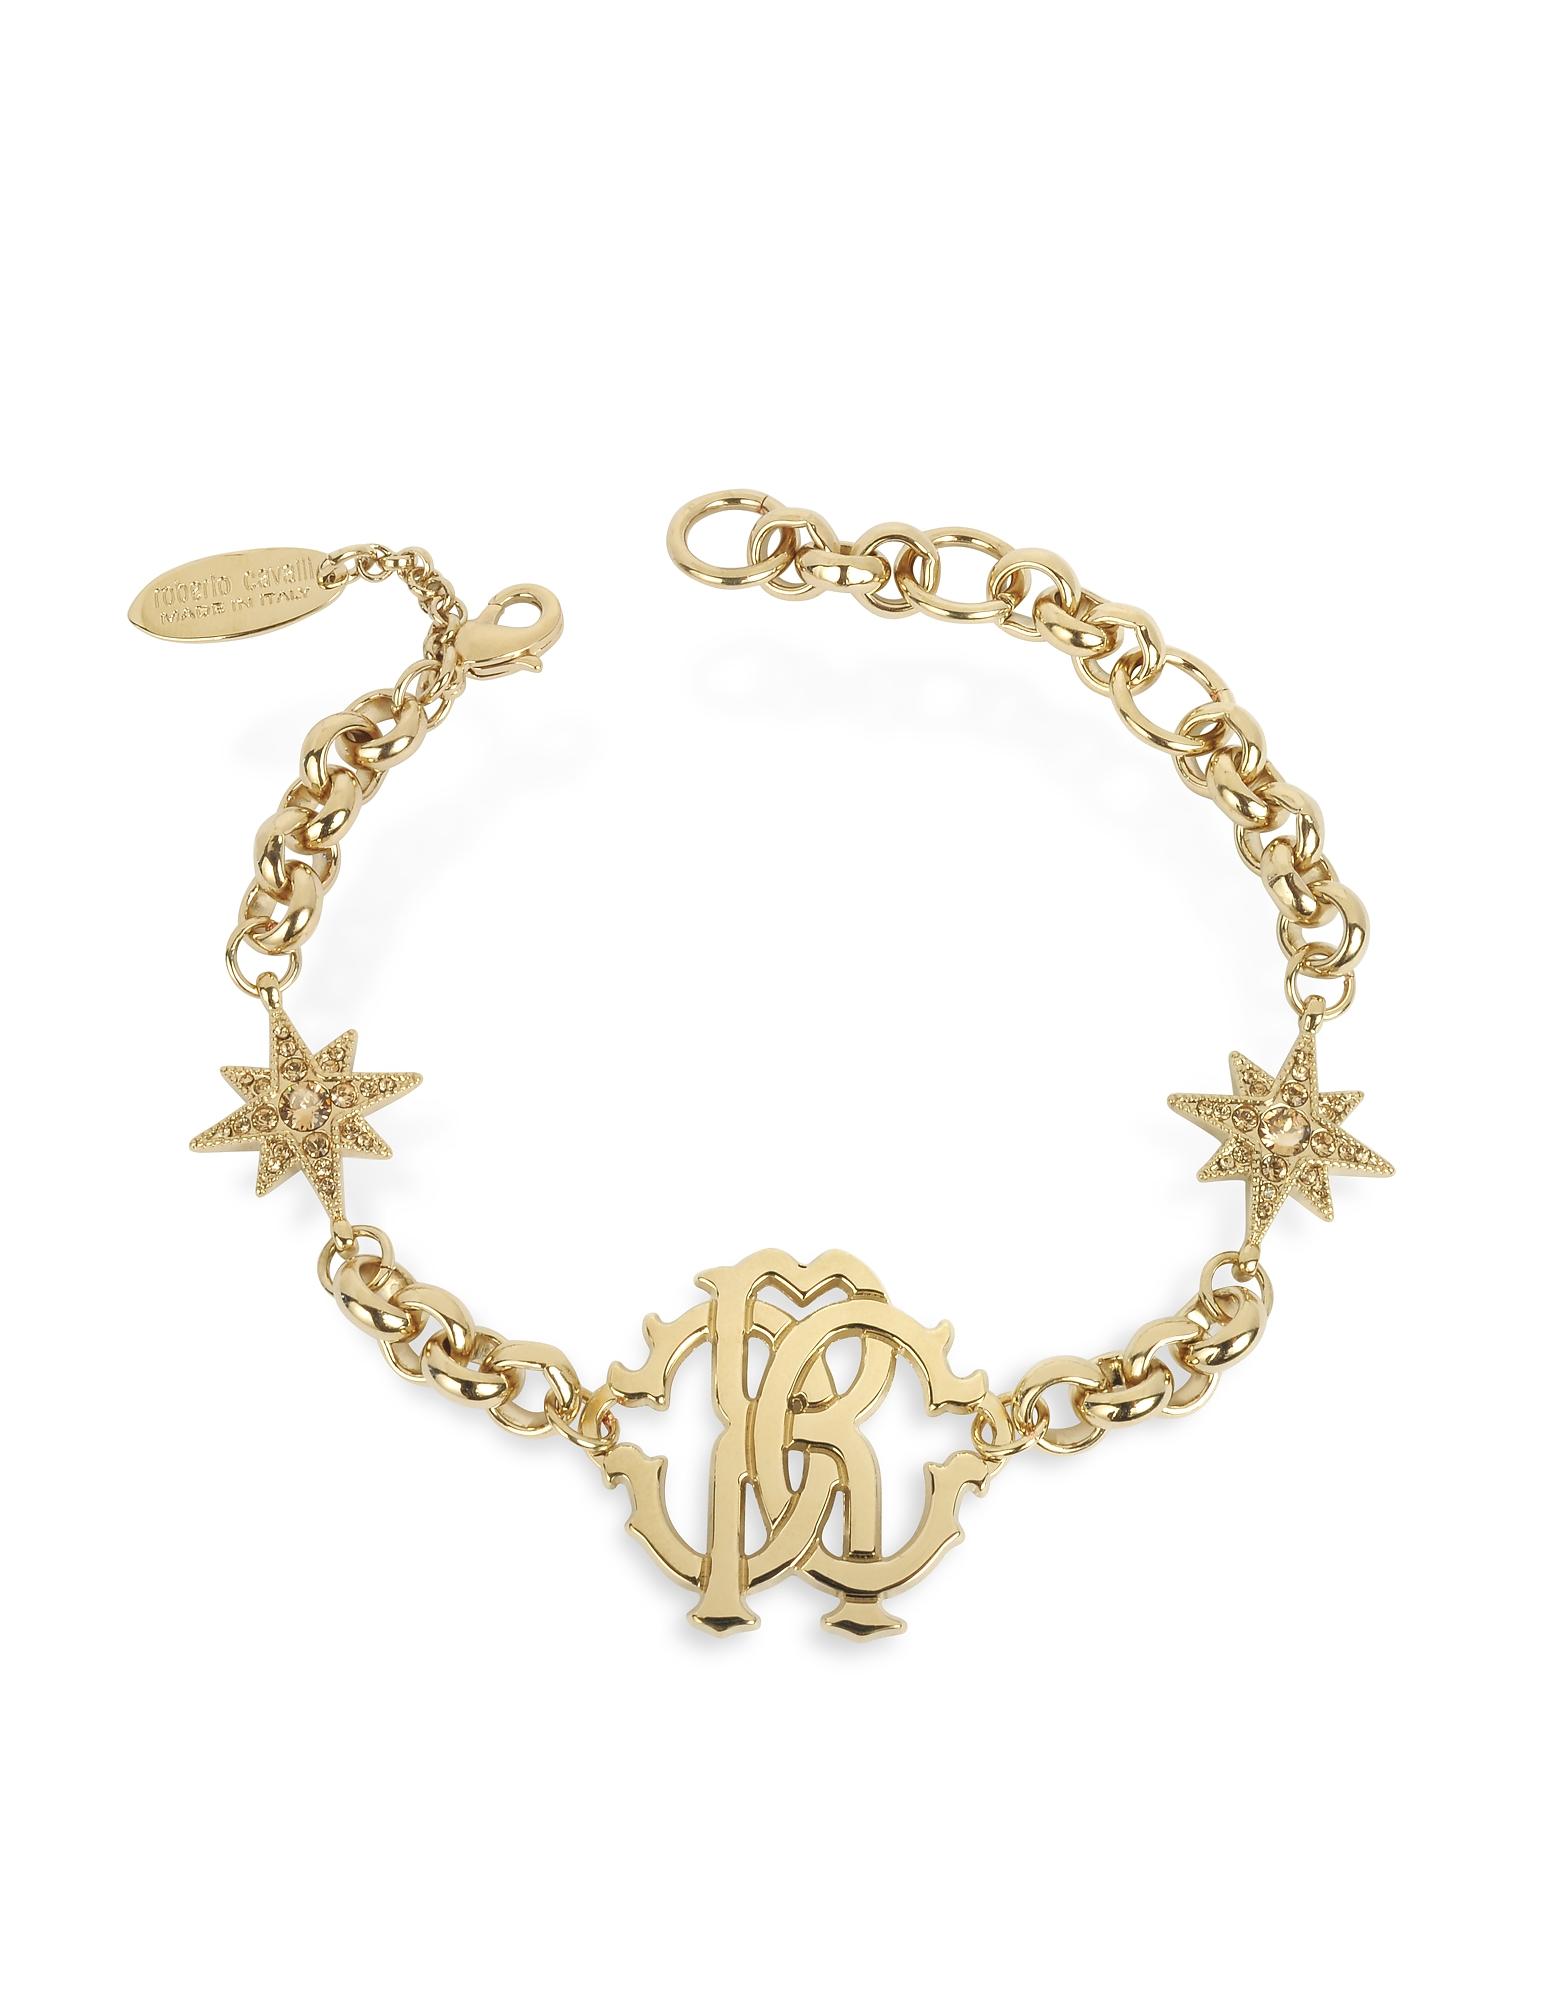 Roberto Cavalli Bracelets, RC Icon Golden Metal Bracelet w/Stars